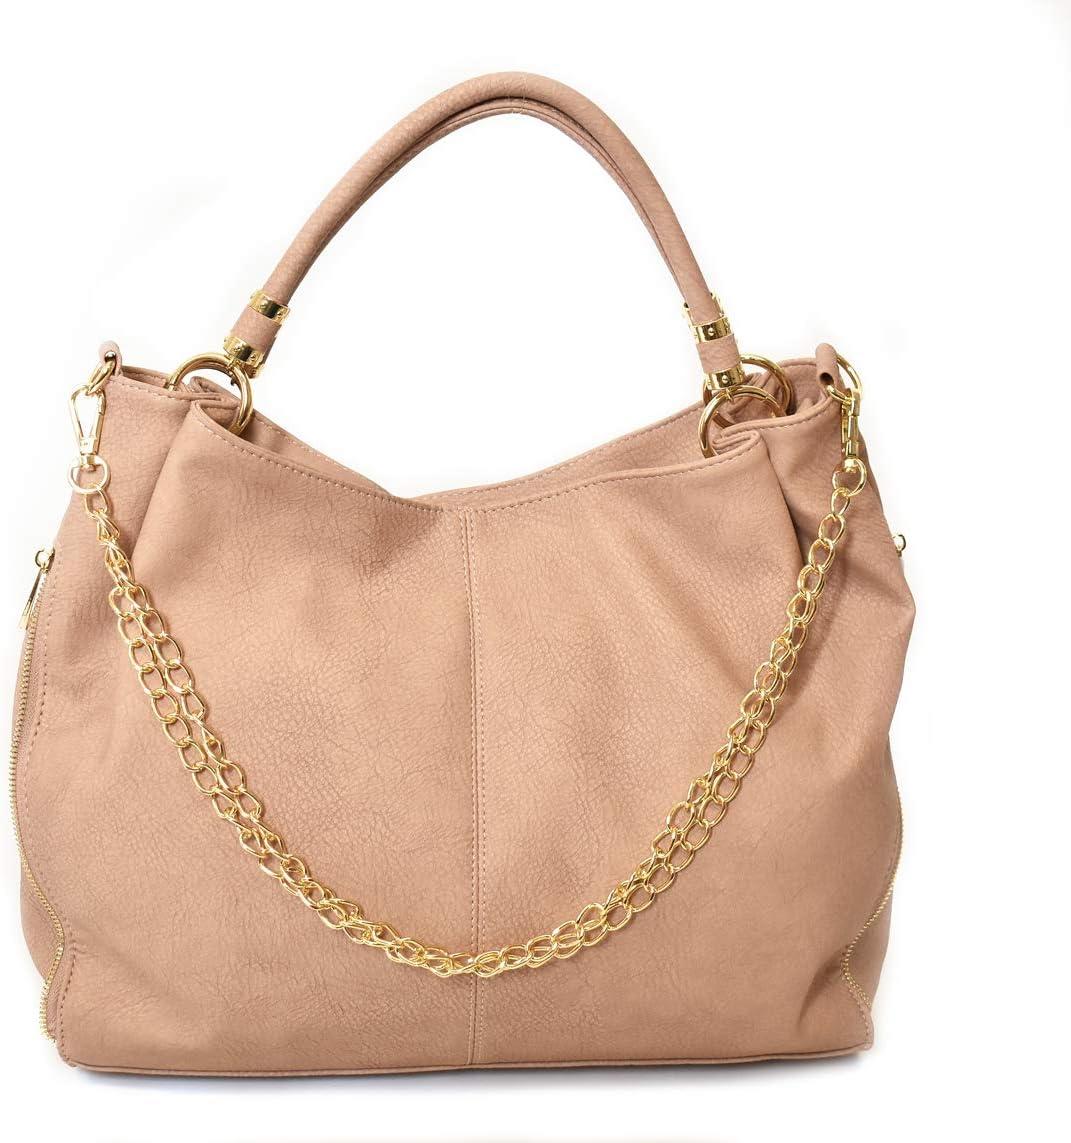 Charming Charlie Women's Slouchy Hobo Bag w/Chain Detail - Crossbody Strap, Side Zipper Design - Pink